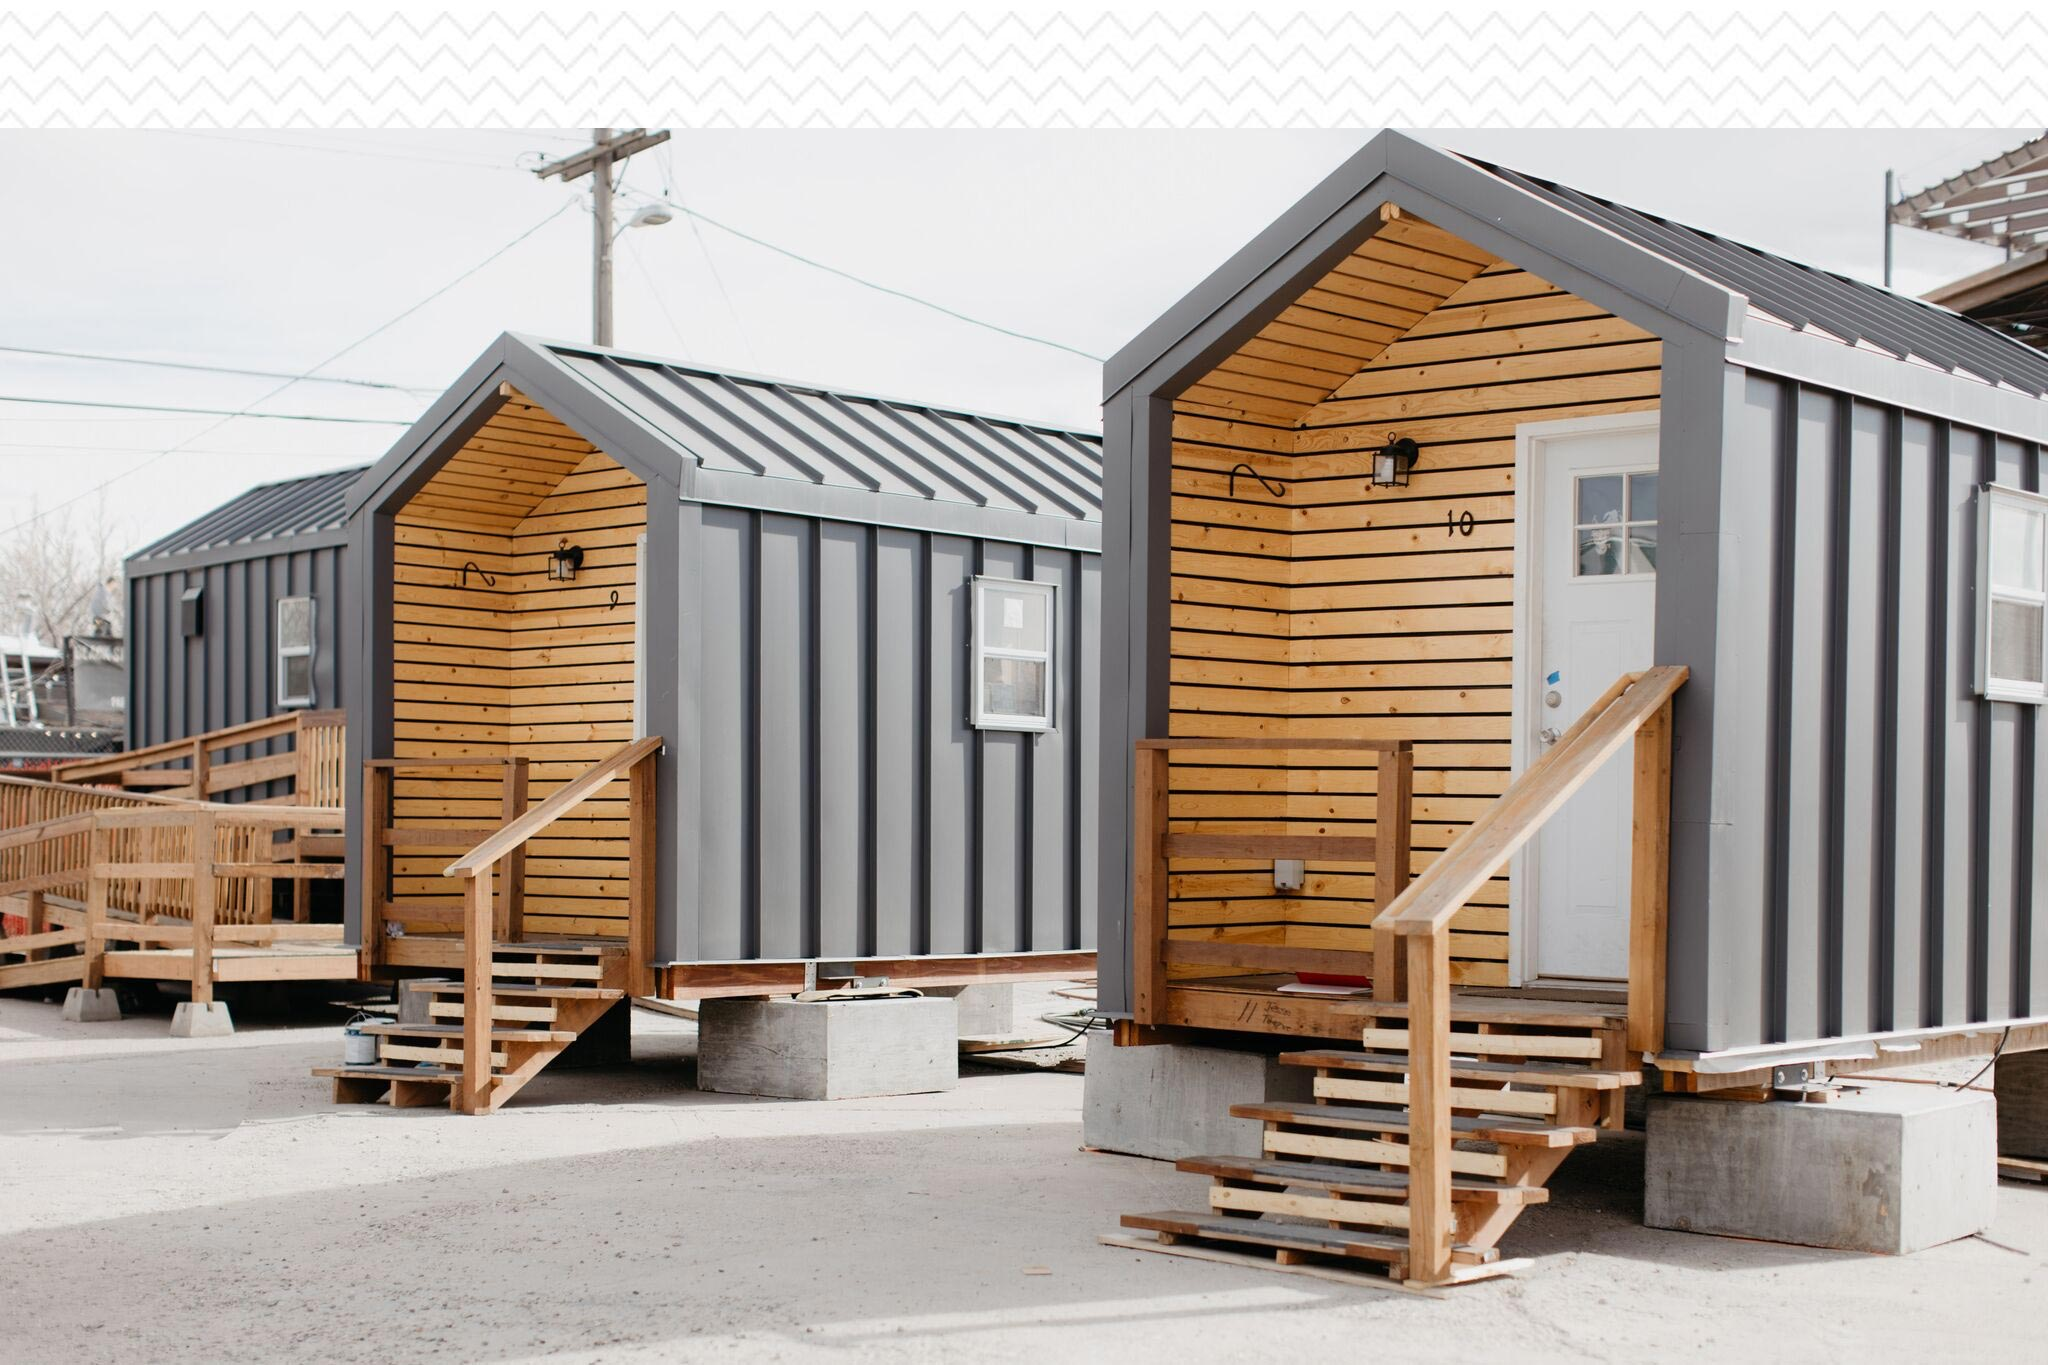 Tiny Home Initiative -